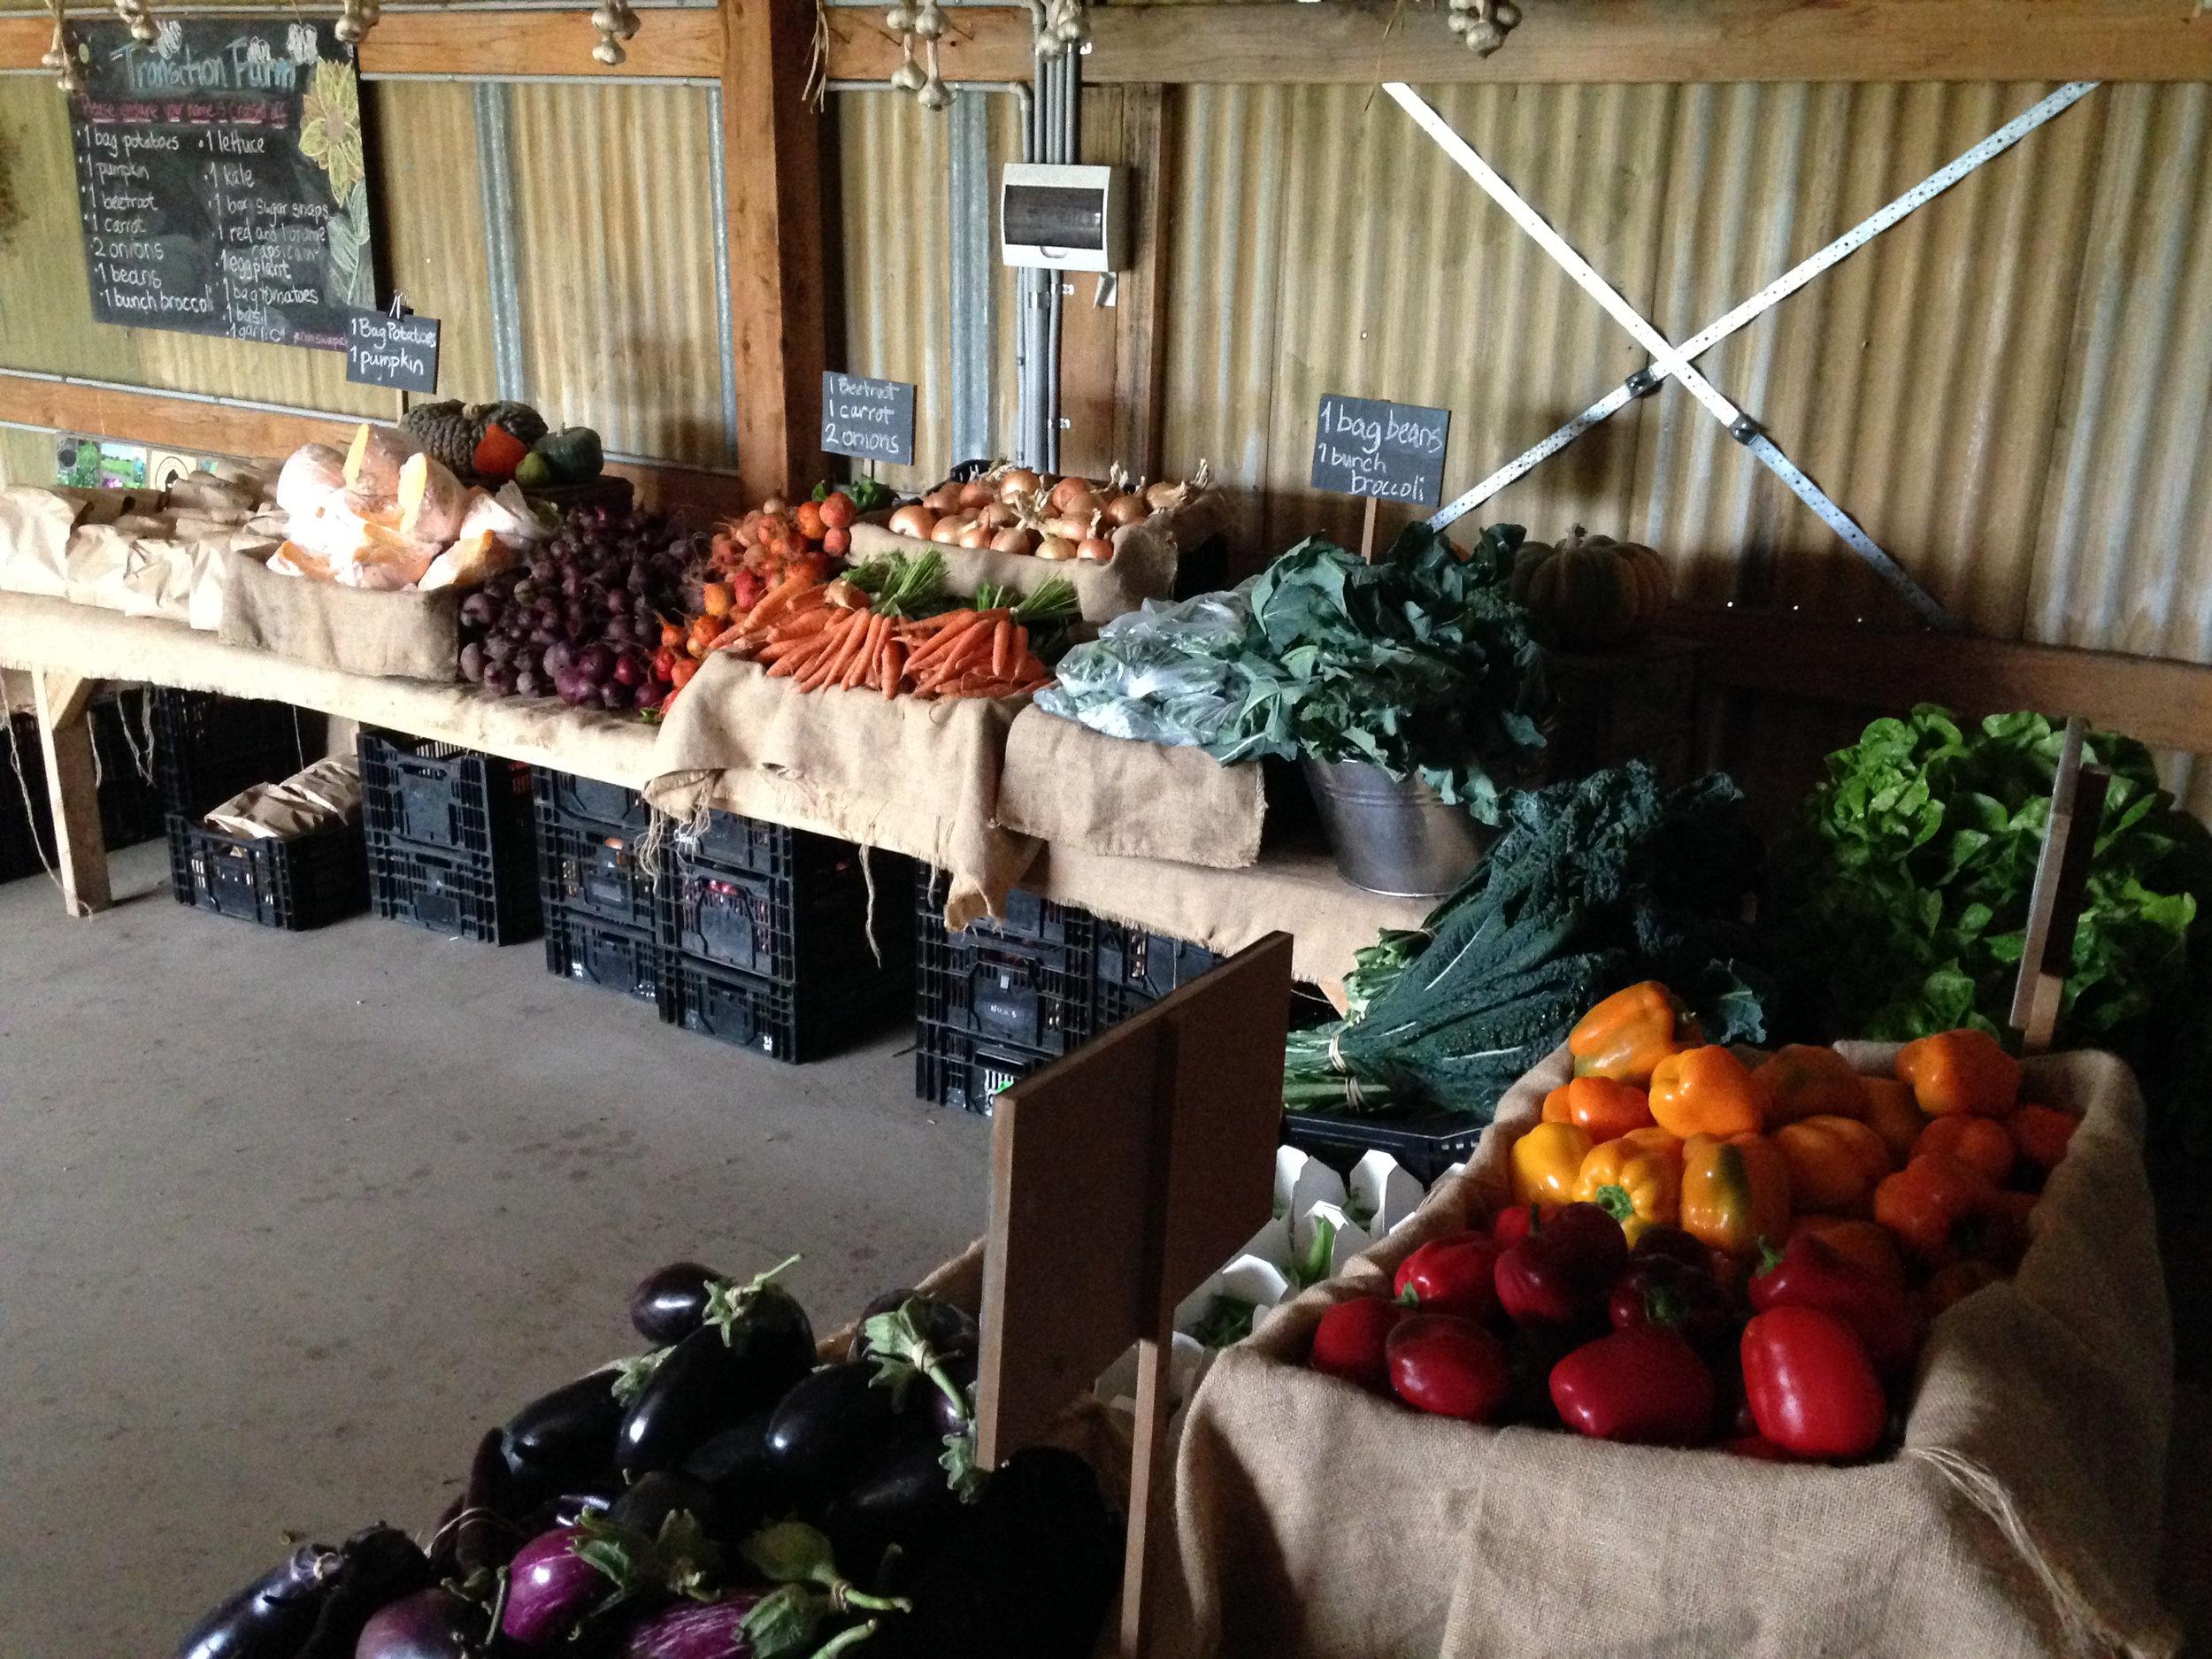 Market style farm pick up at transition farm